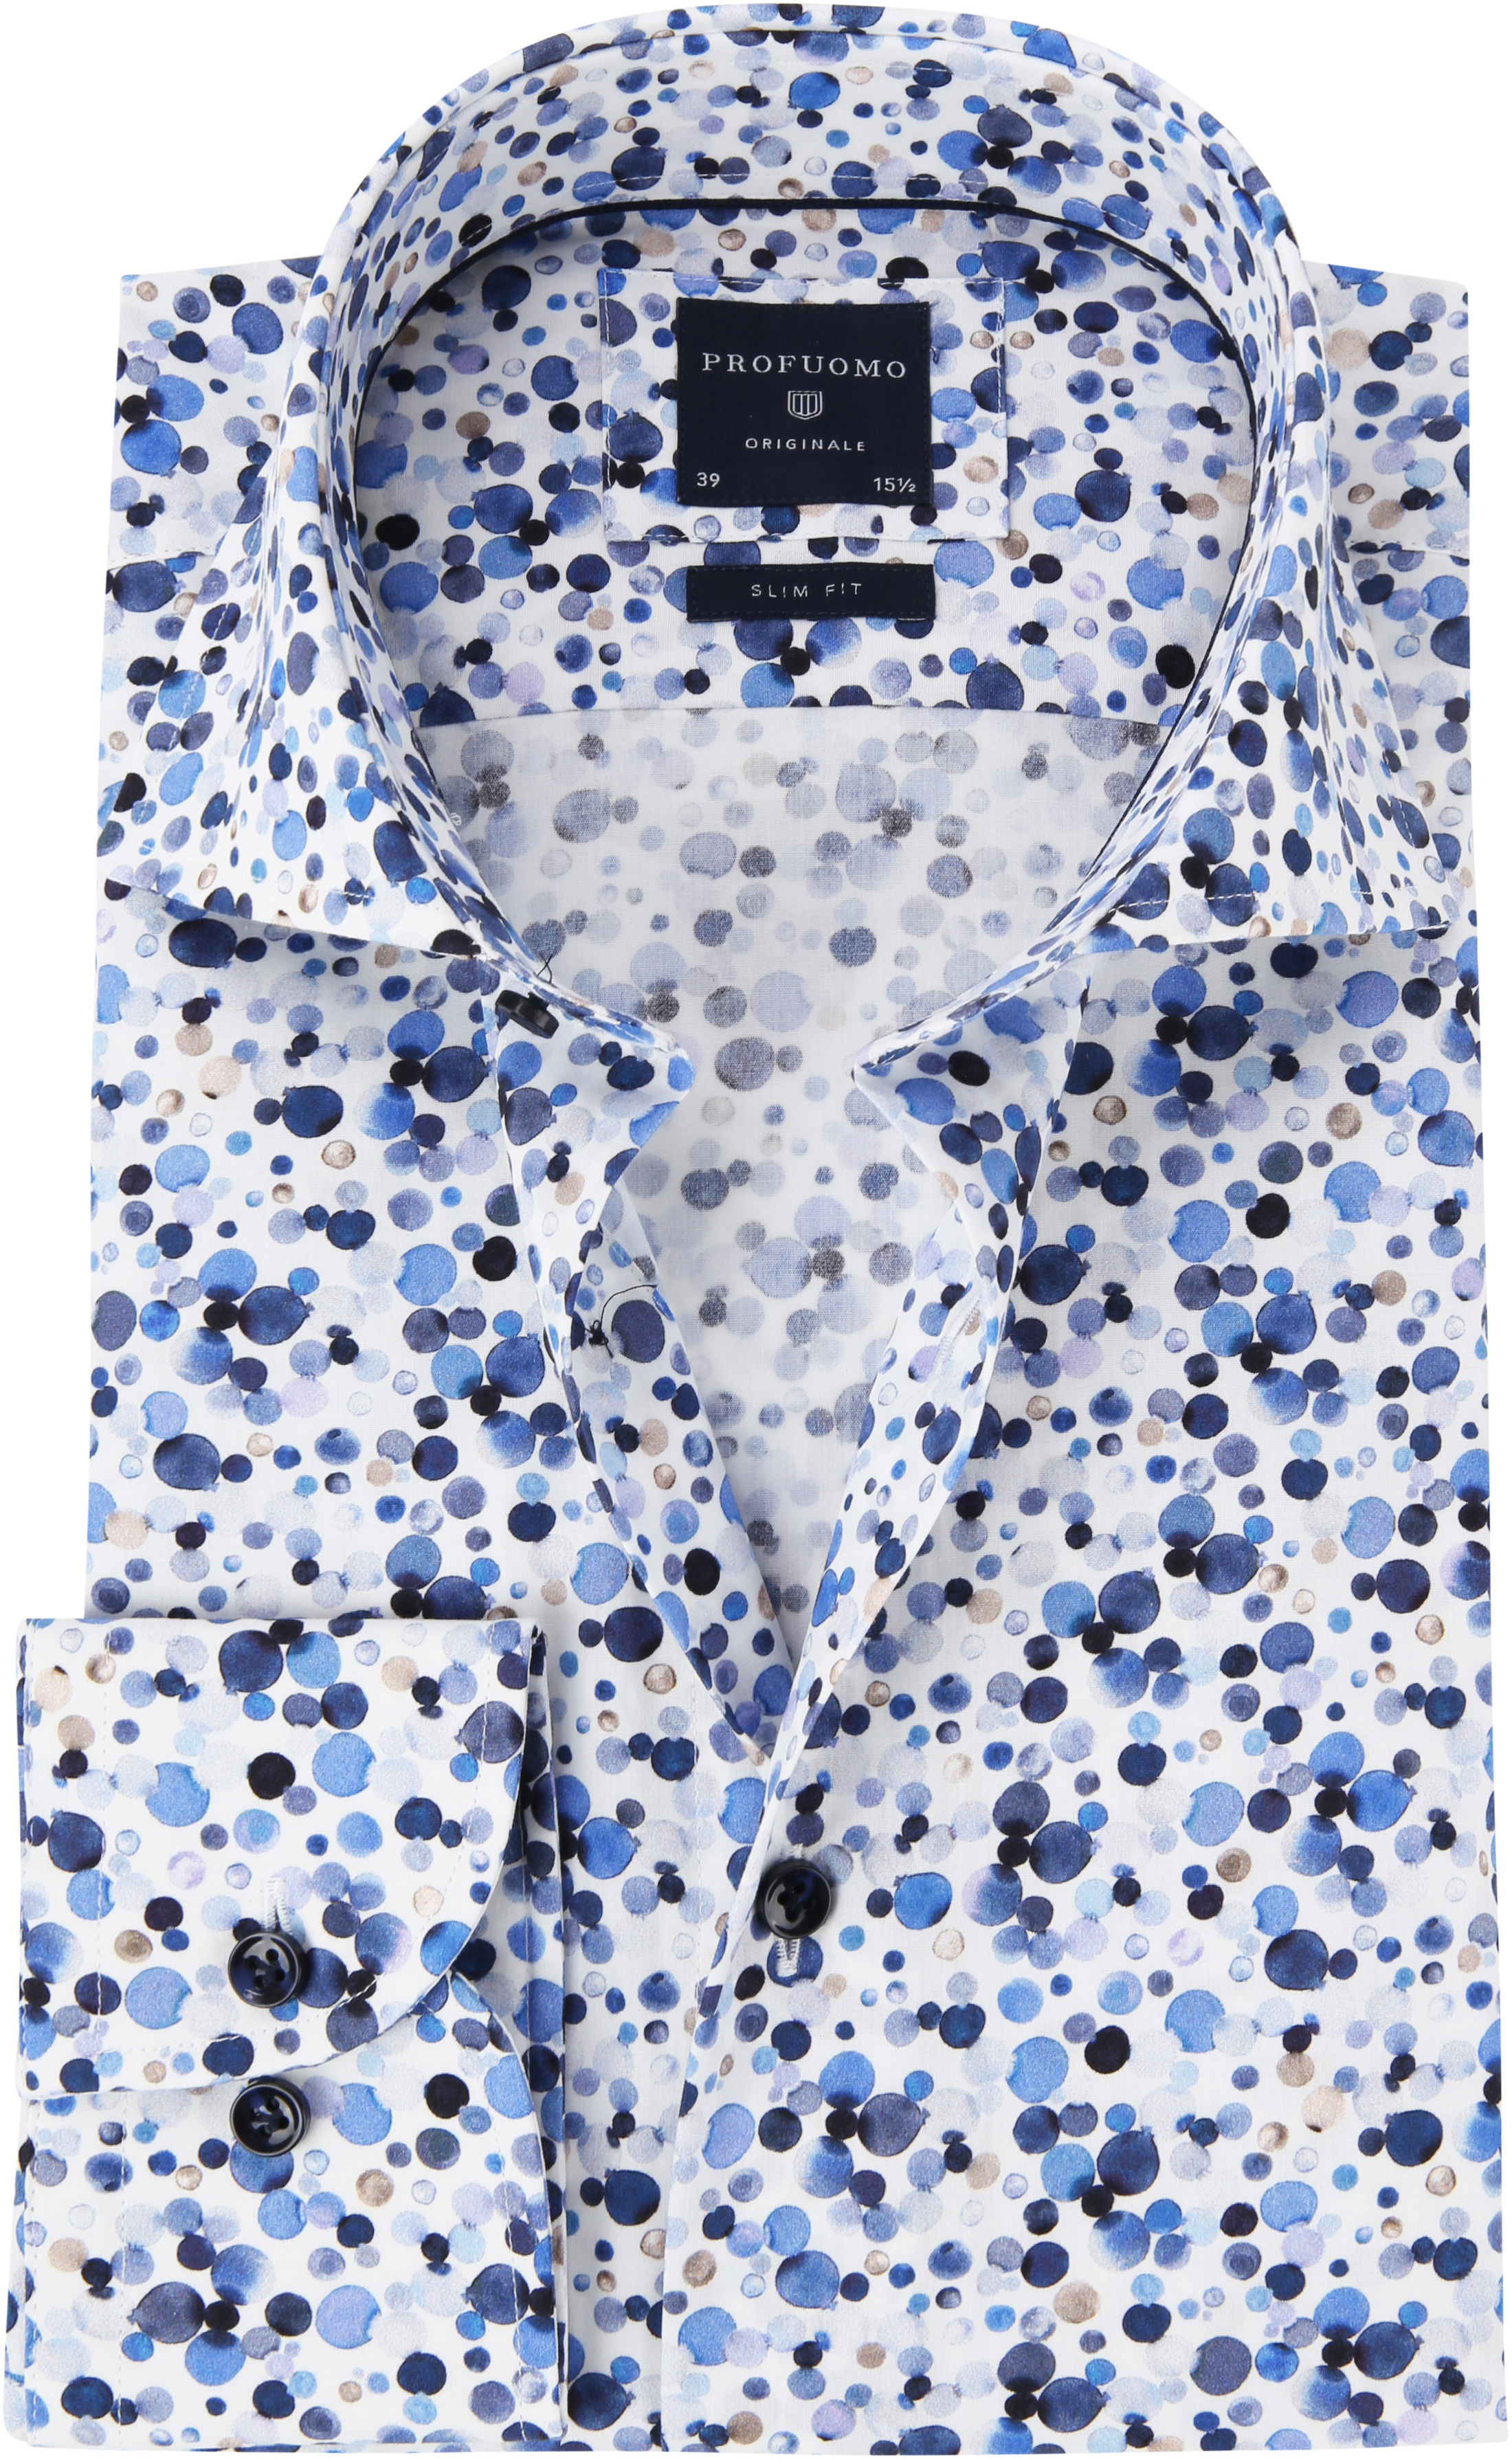 Profuomo Overhemd Polka Dot Blue photo 0